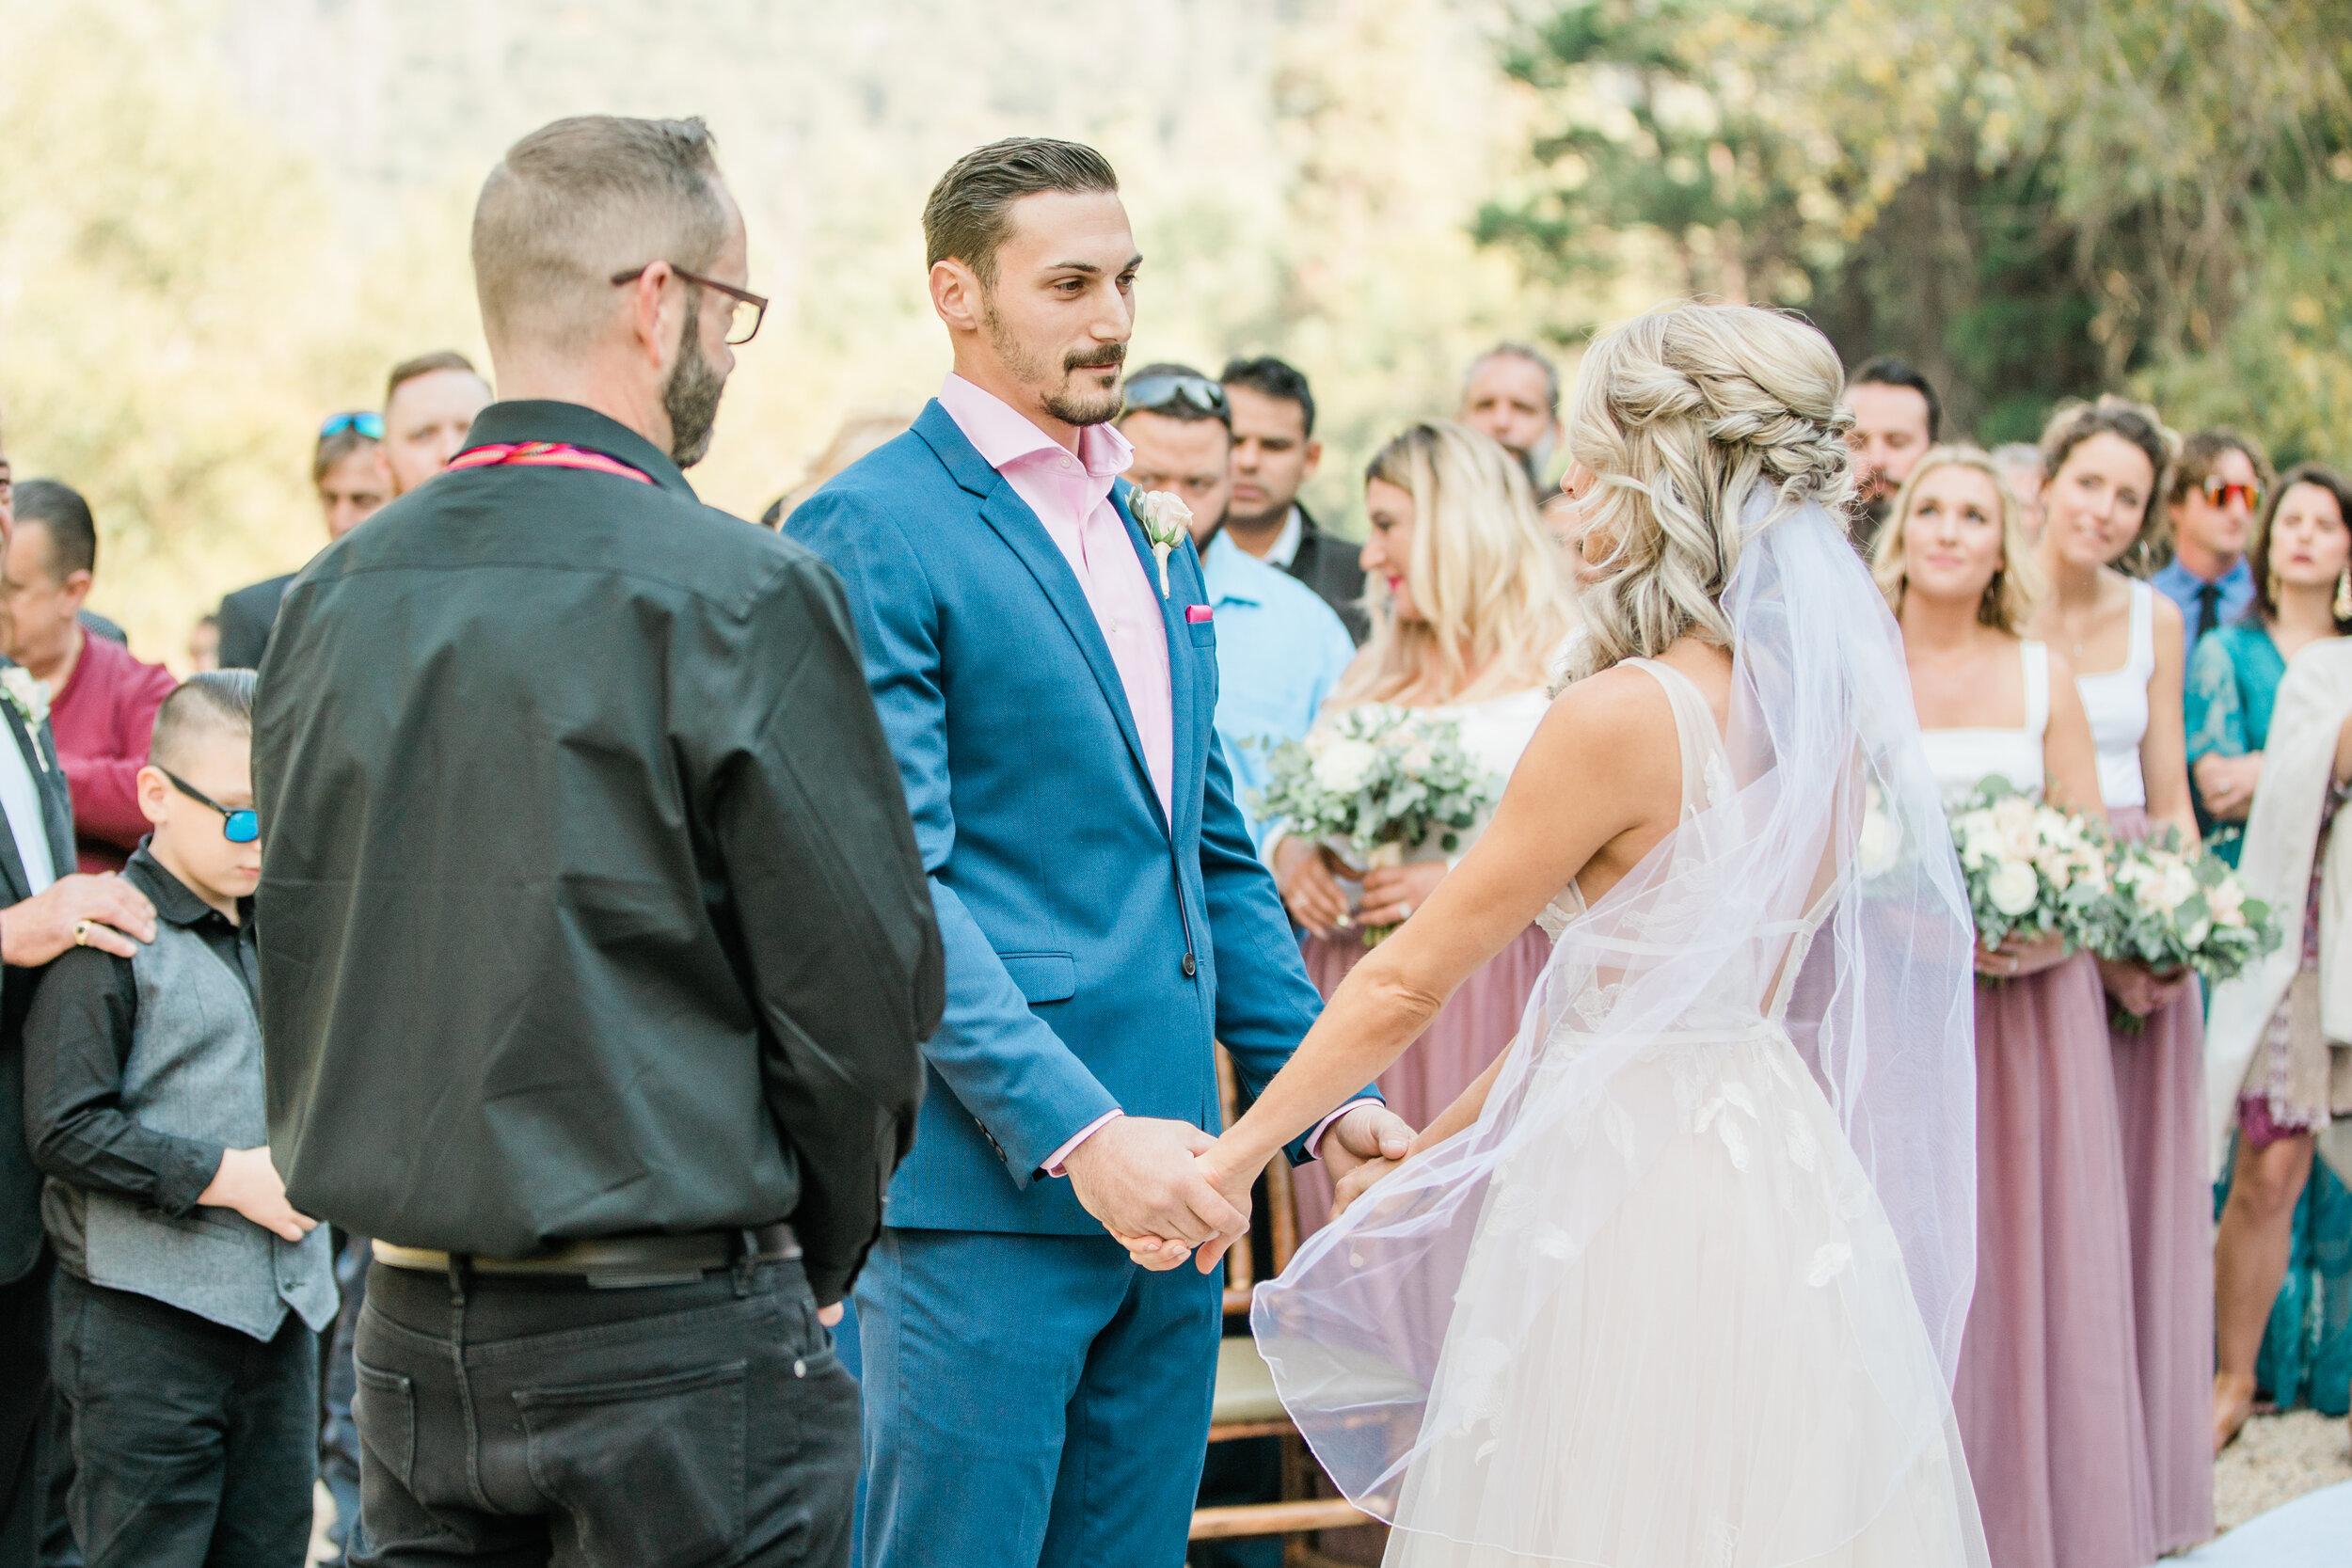 Leanne and Joe - Married - Sneak Peeks - Lauren Alisse Photography-16.jpg